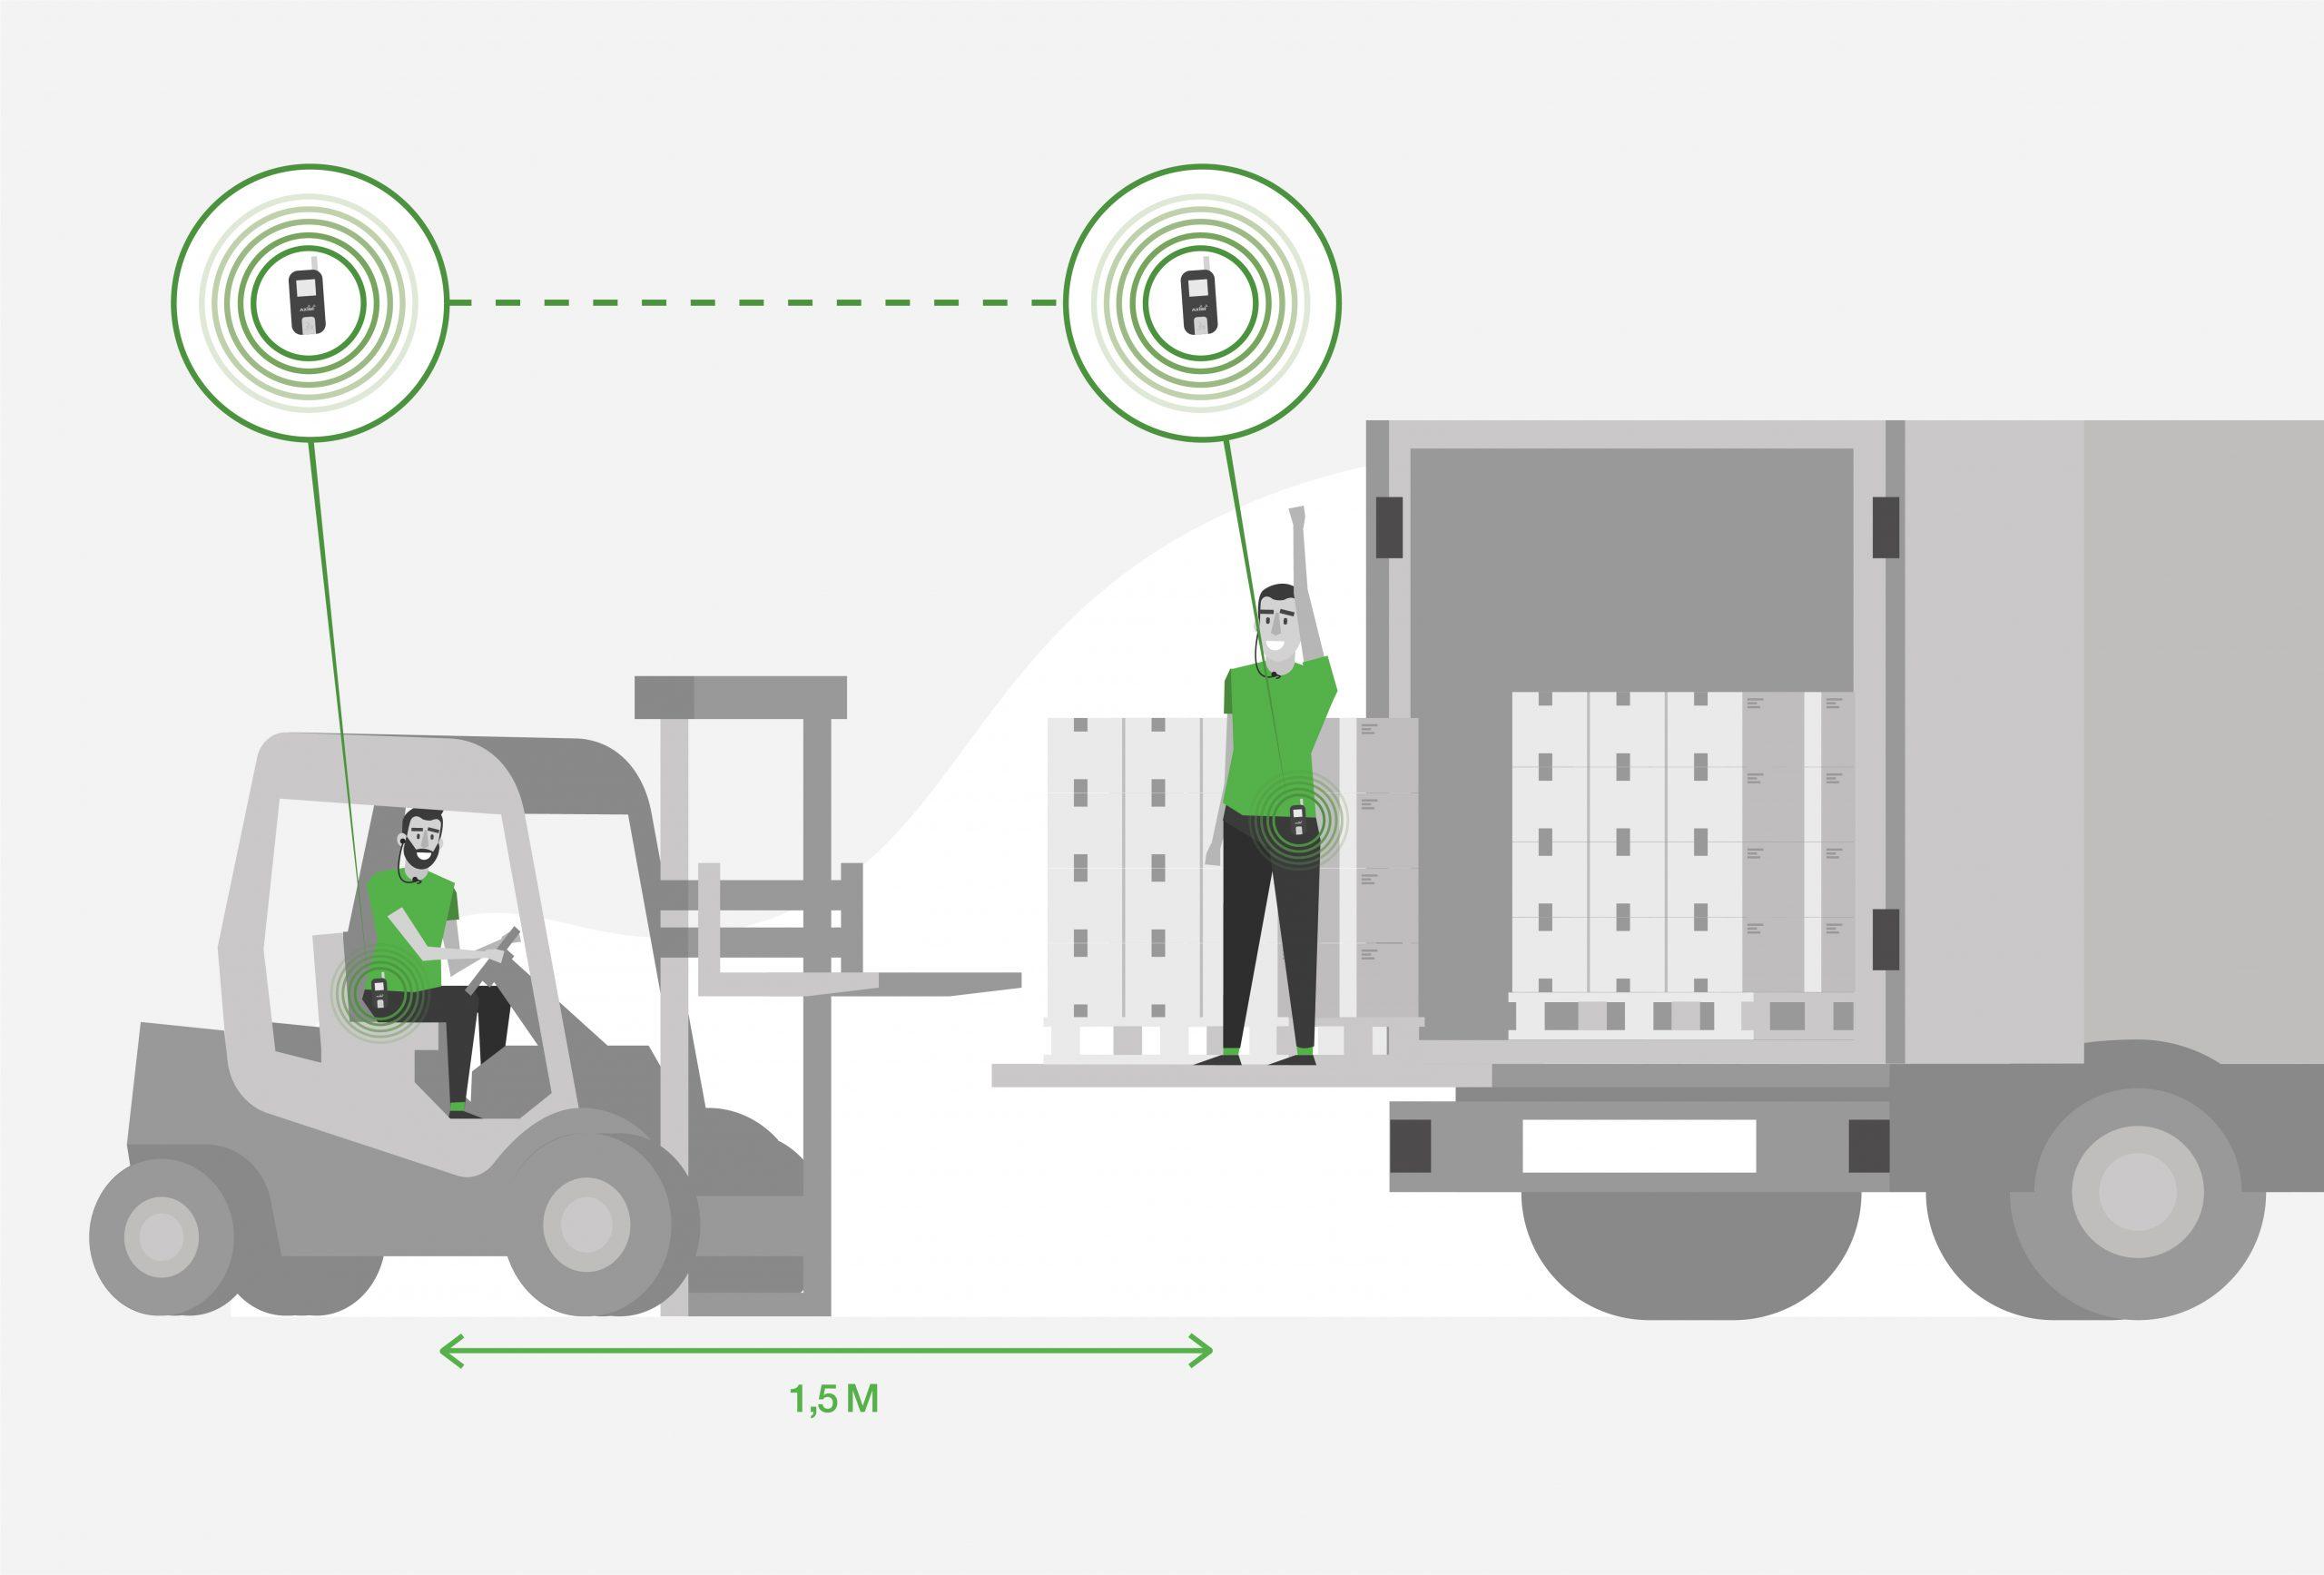 axiwi-drahtlosen-kommunikationssteme-logistik-transport-gabelstapler